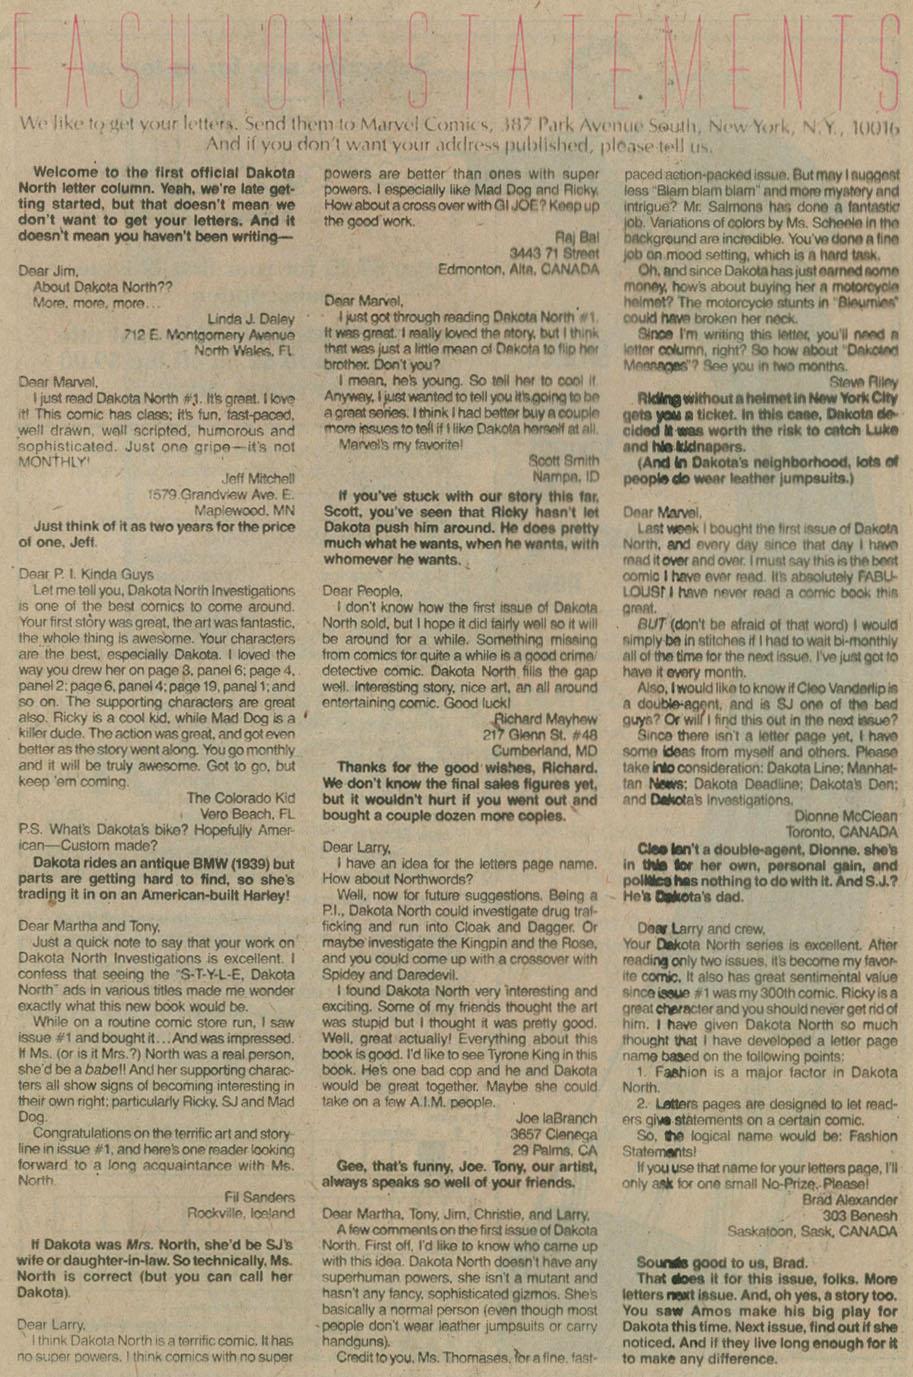 Read online Dakota North comic -  Issue #4 - 24